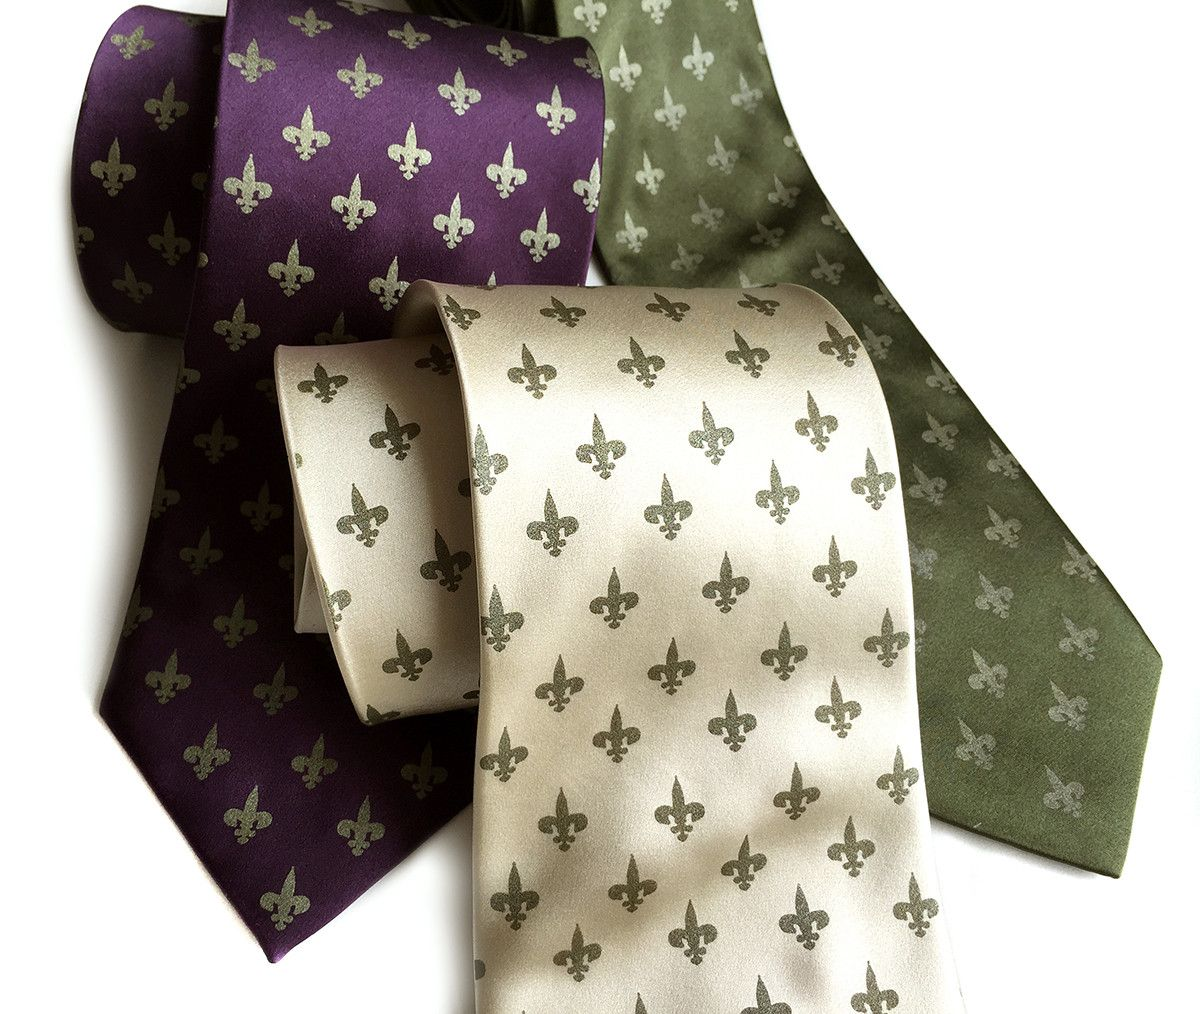 Fleur-de-lis silk necktie